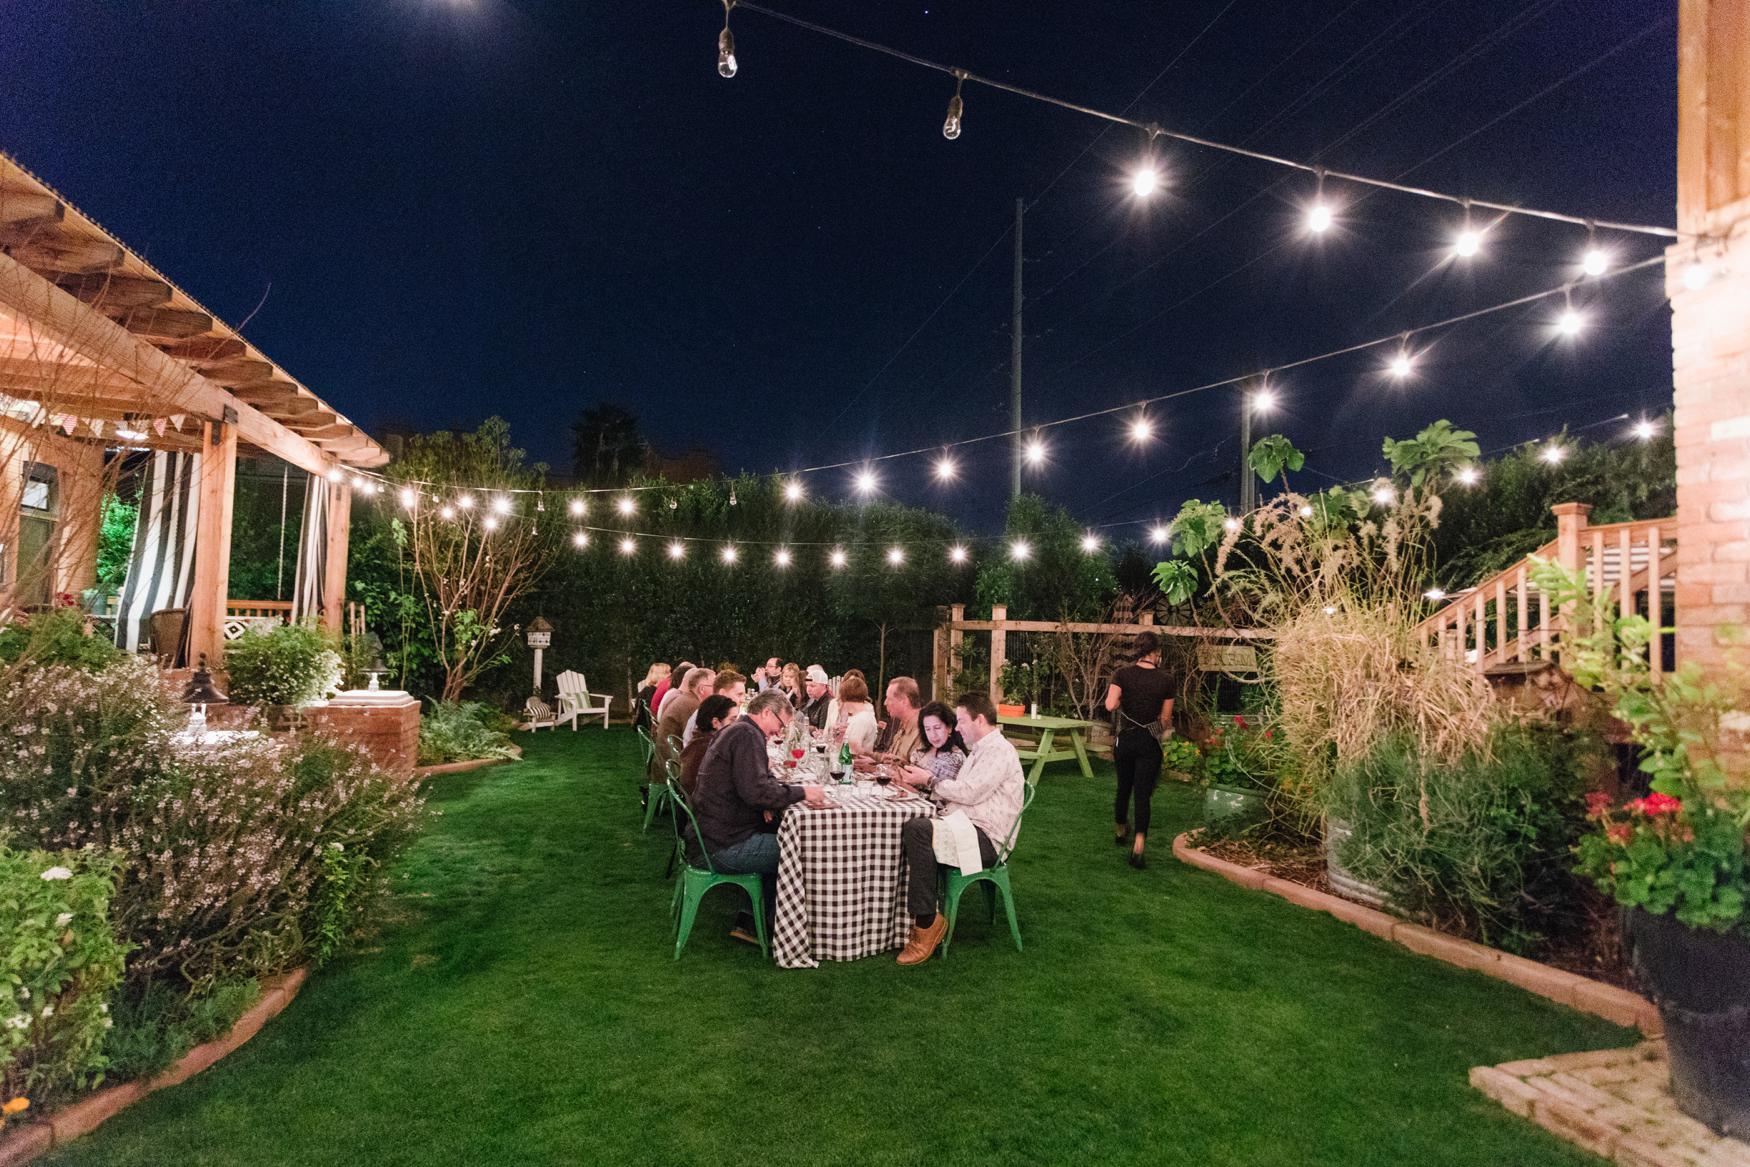 Boho Farm and Home Dinner theme Spain in backyard tapas. A night in the backyard